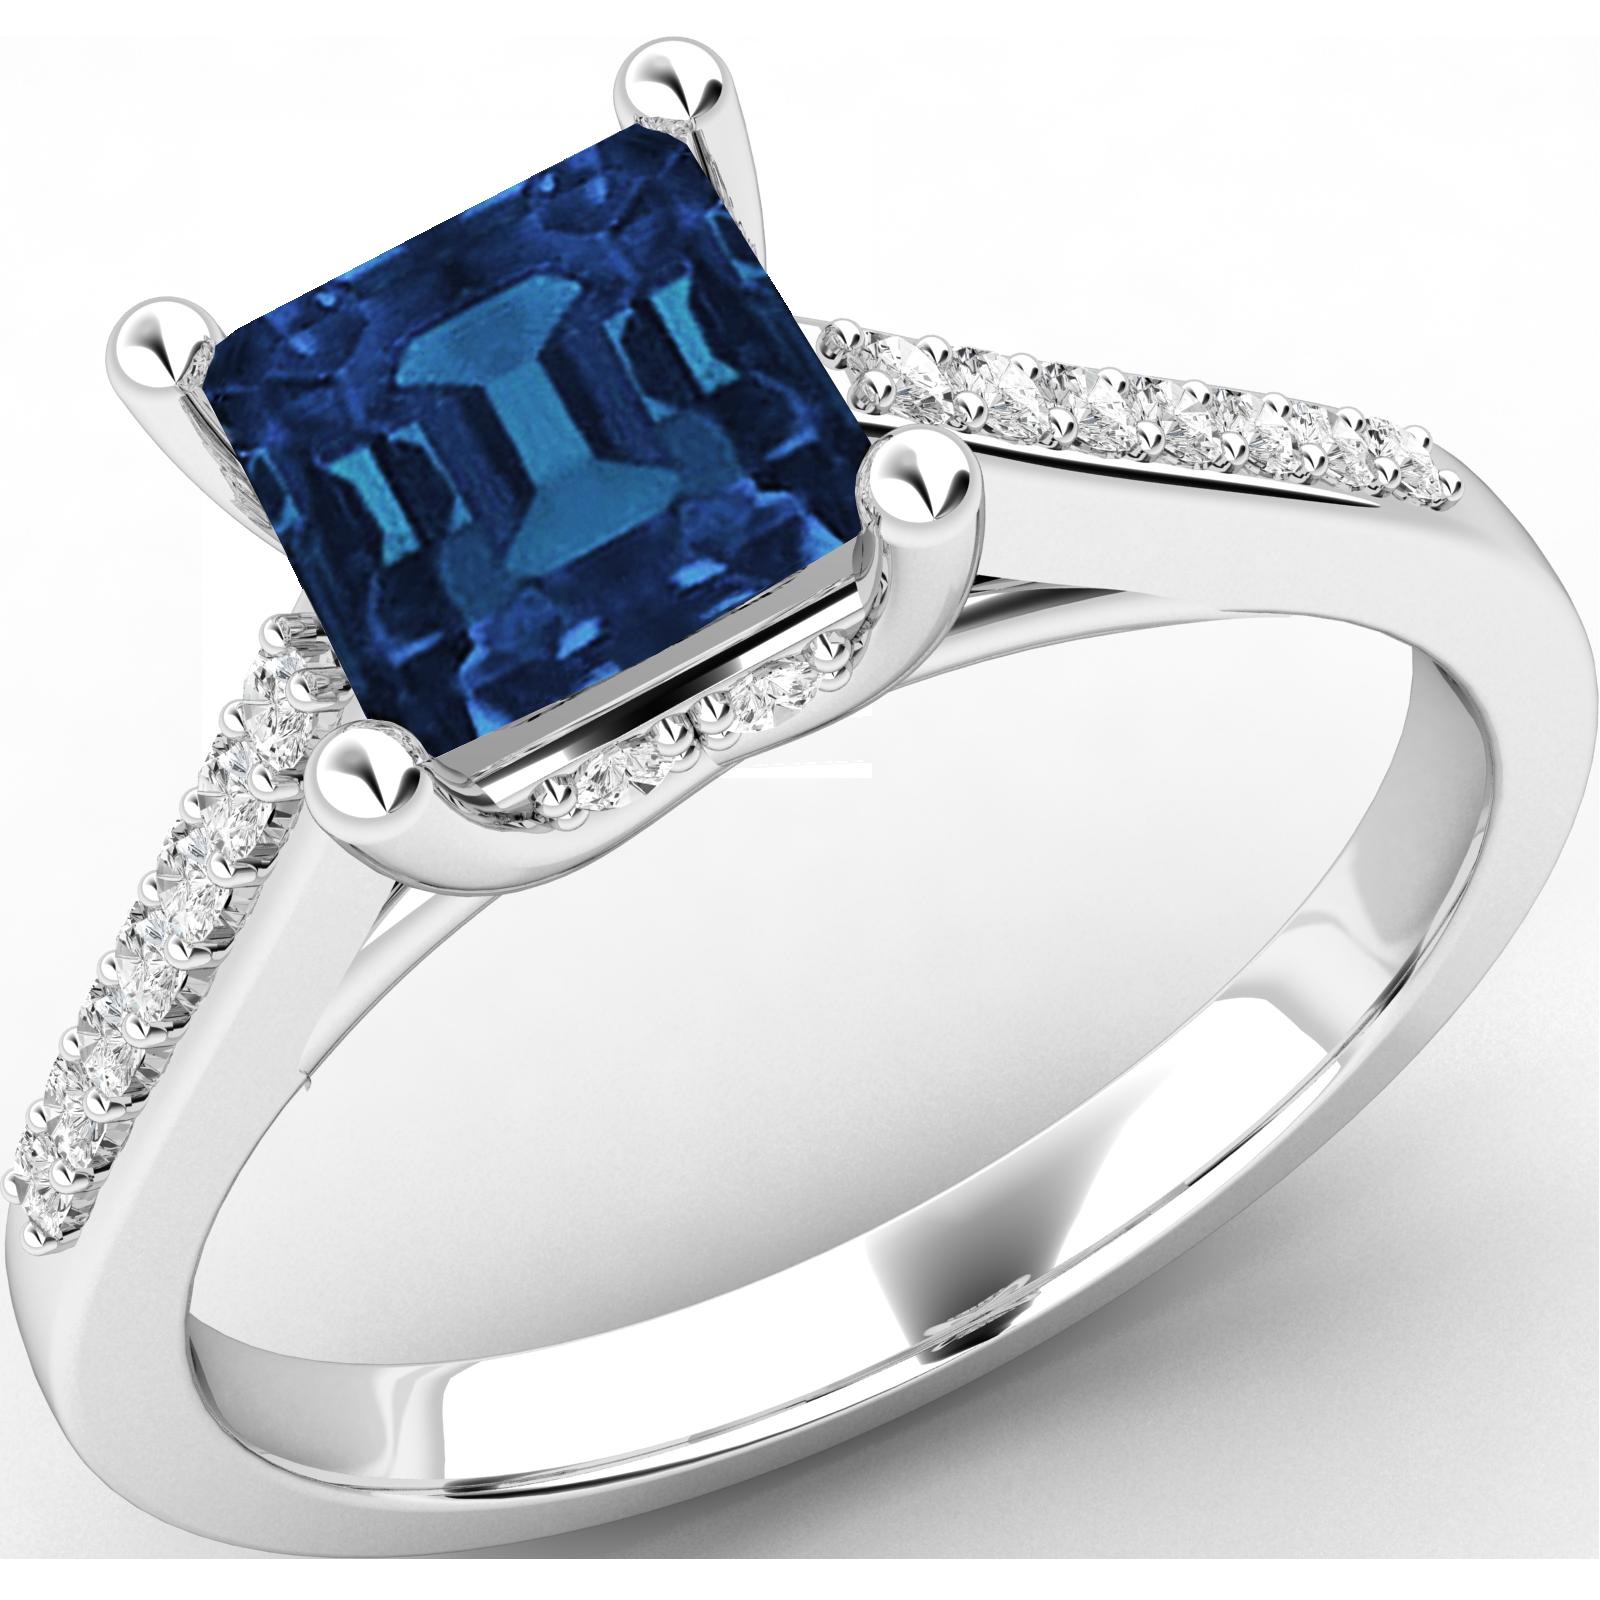 Inel cu Safir si Diamant Dama Aur Alb 18kt cu un Safir Forma Patrata si Diamante Rotunde Briliant-img1